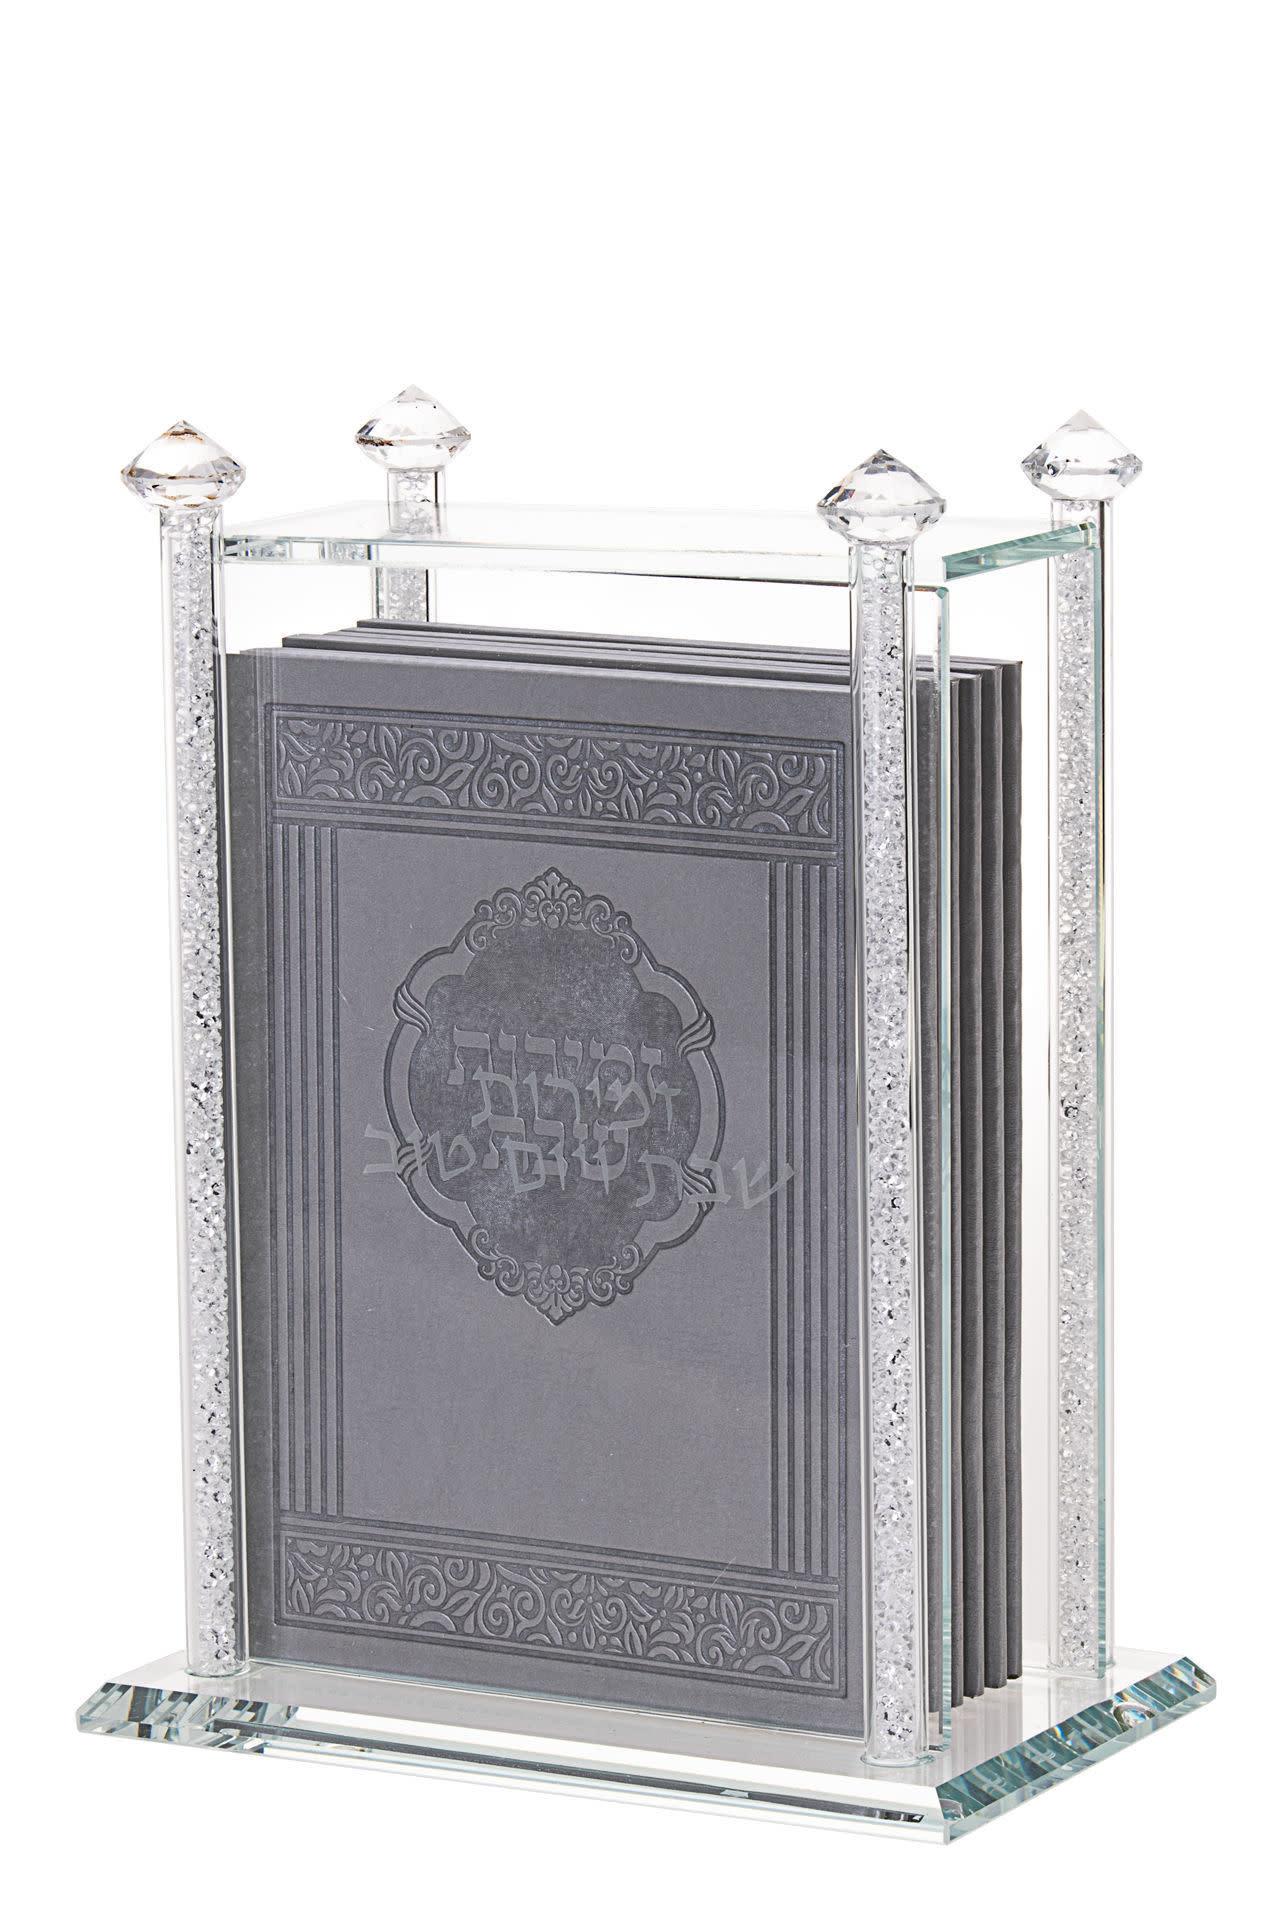 8 Edut Hamizrach Benchers in Crystal Stone Holder